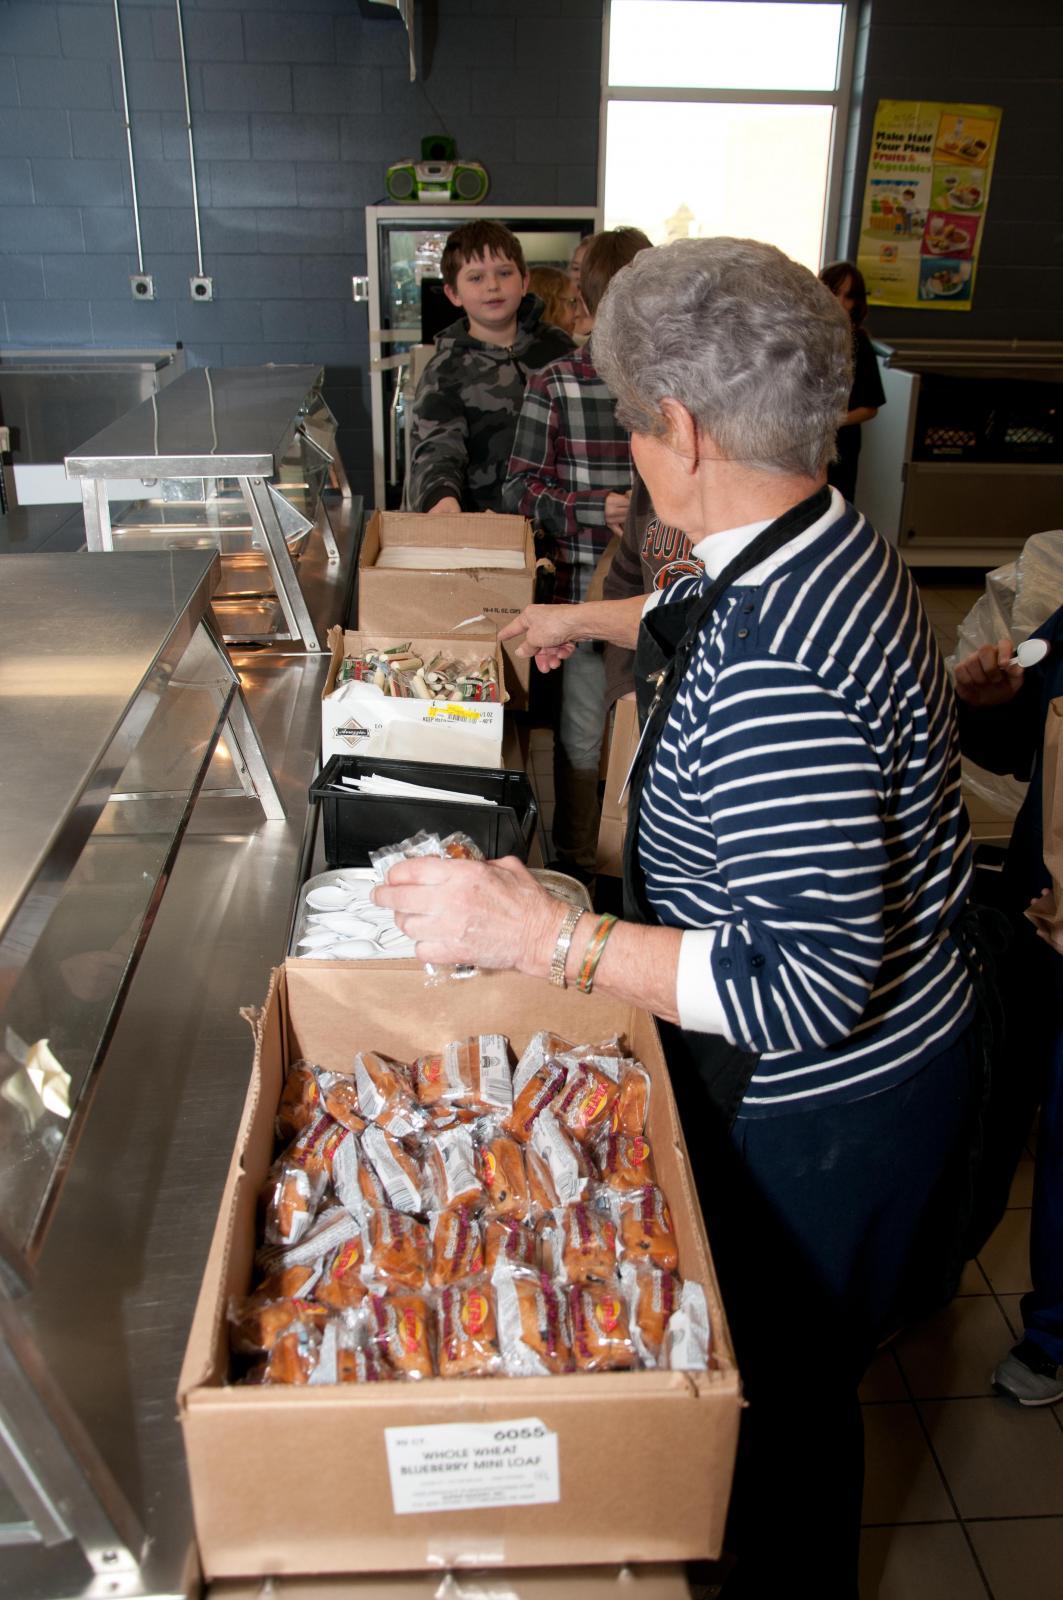 Norris School District: Norris District A Winner In Statewide School Breakfast